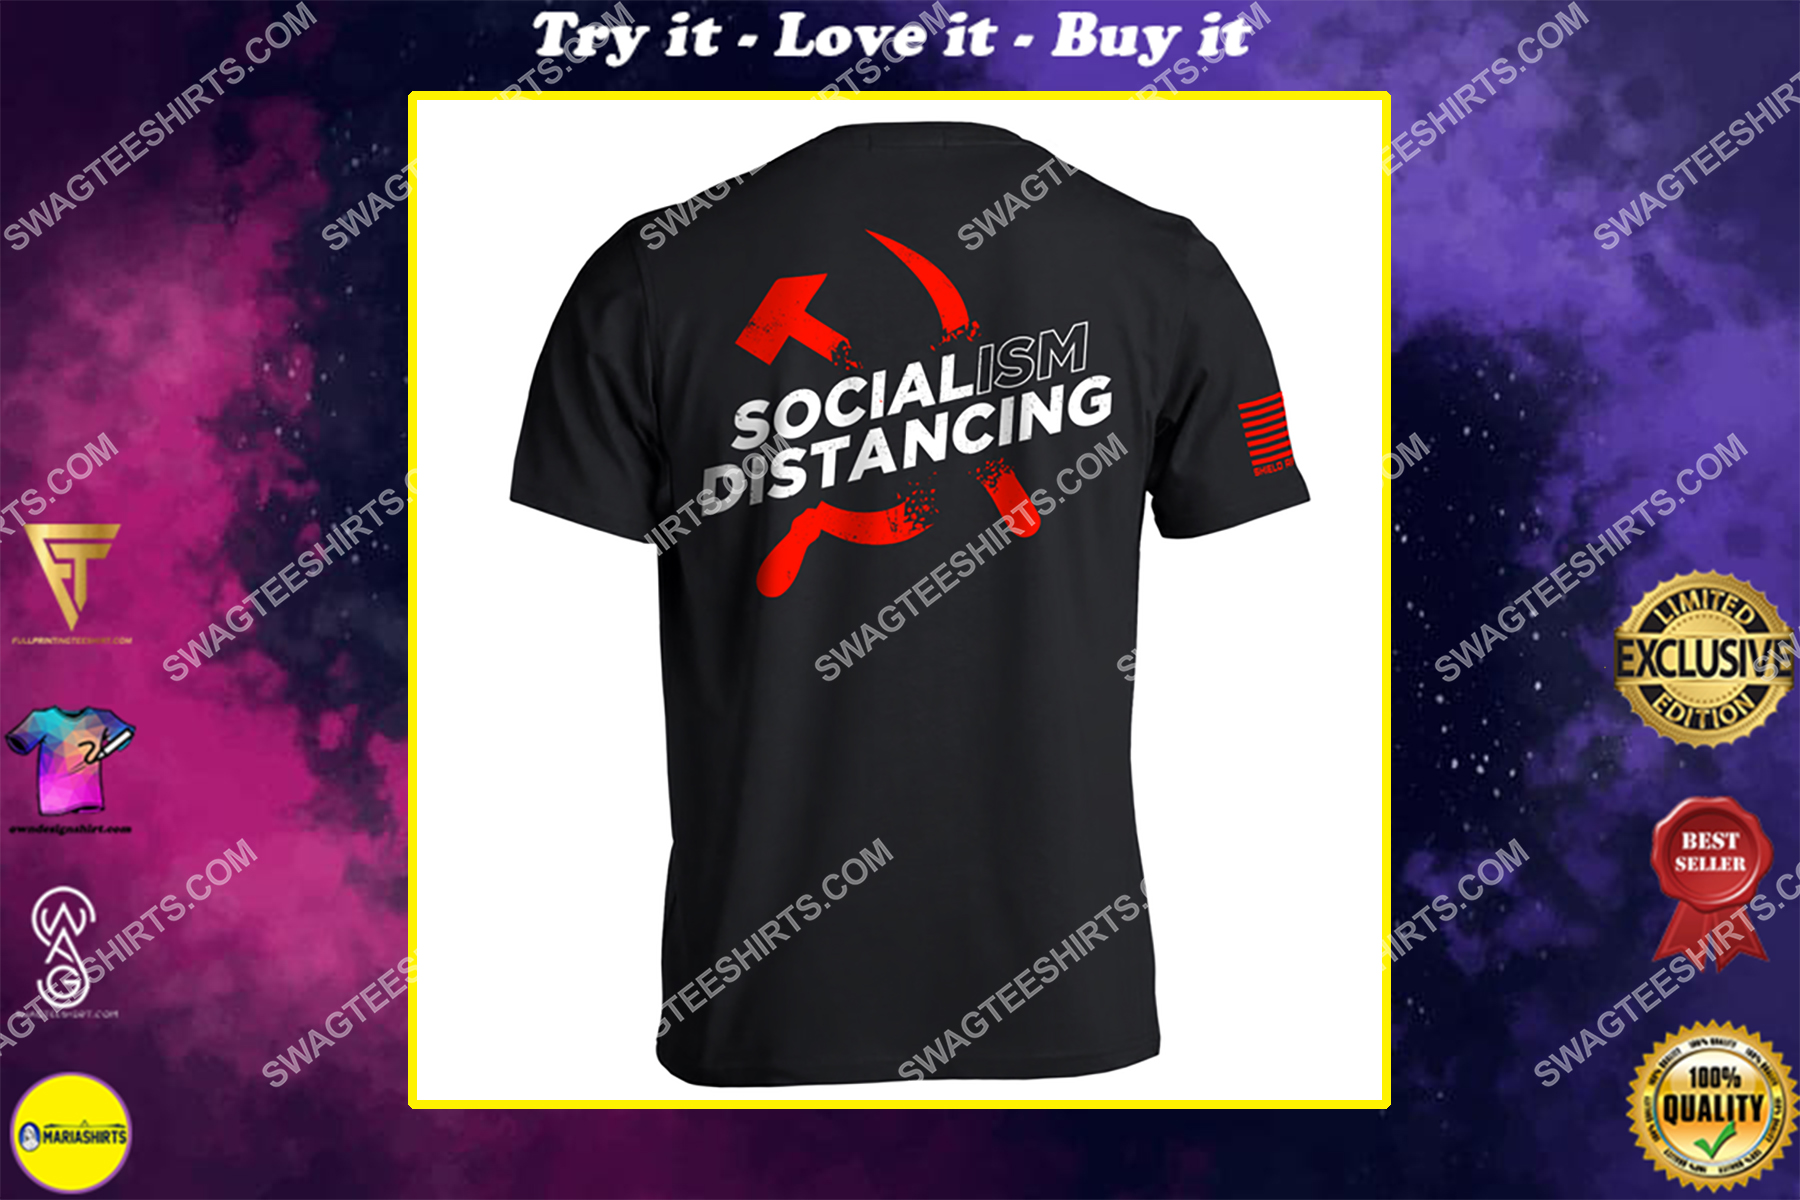 socialism distancing anti socialism political full print shirt